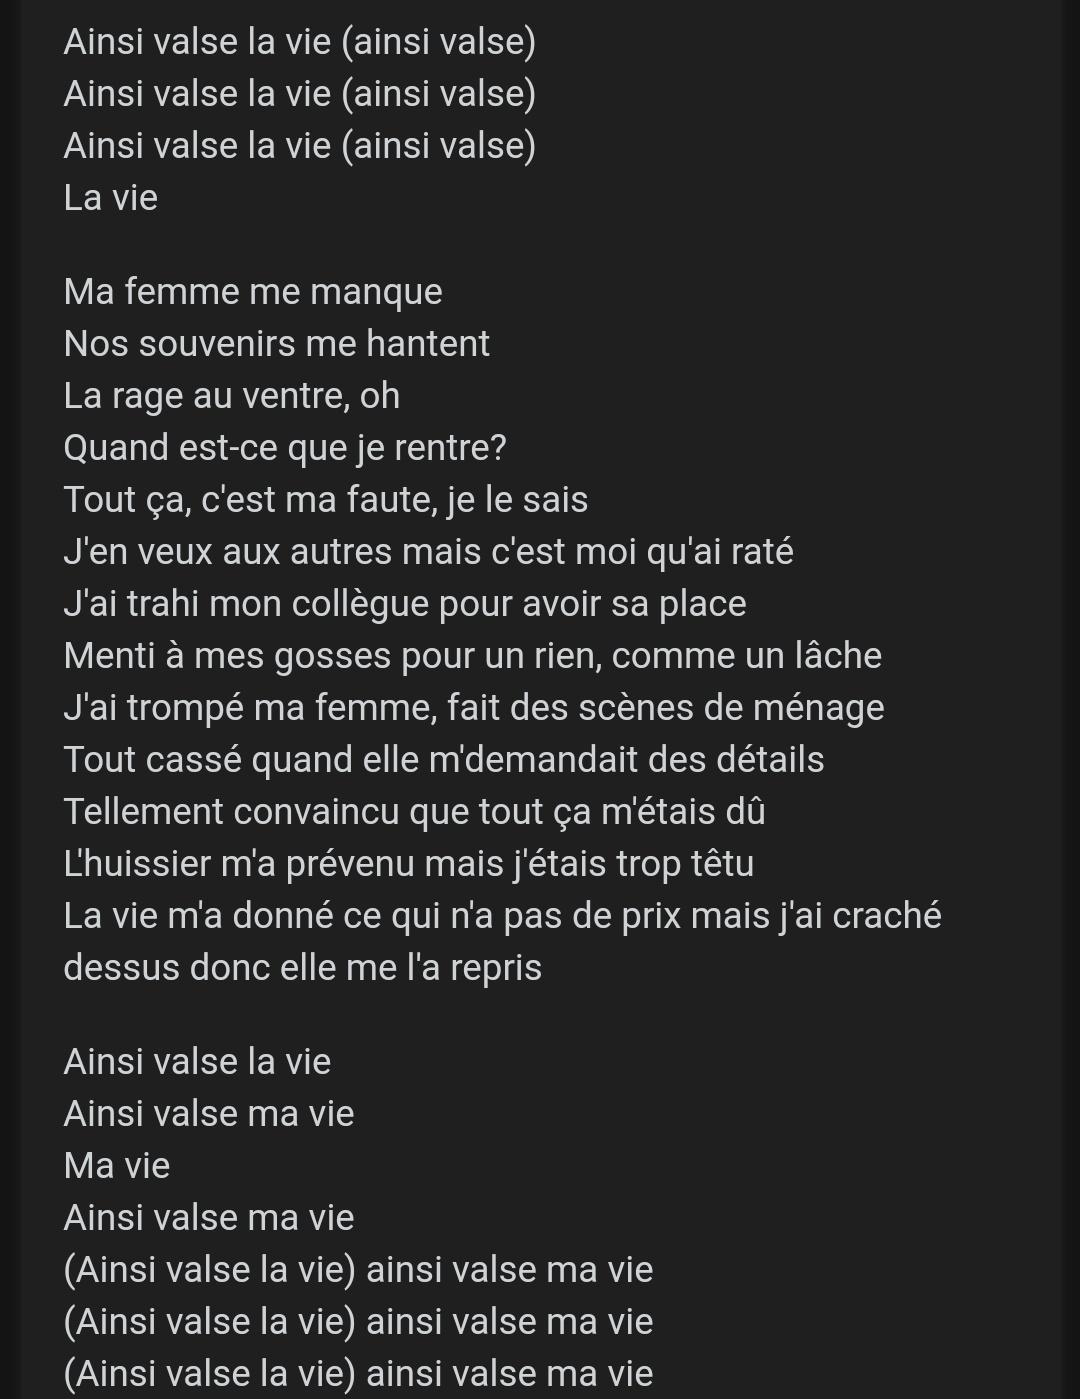 AINSI VALSE LA VIE - Blak M - LETRAS.COM